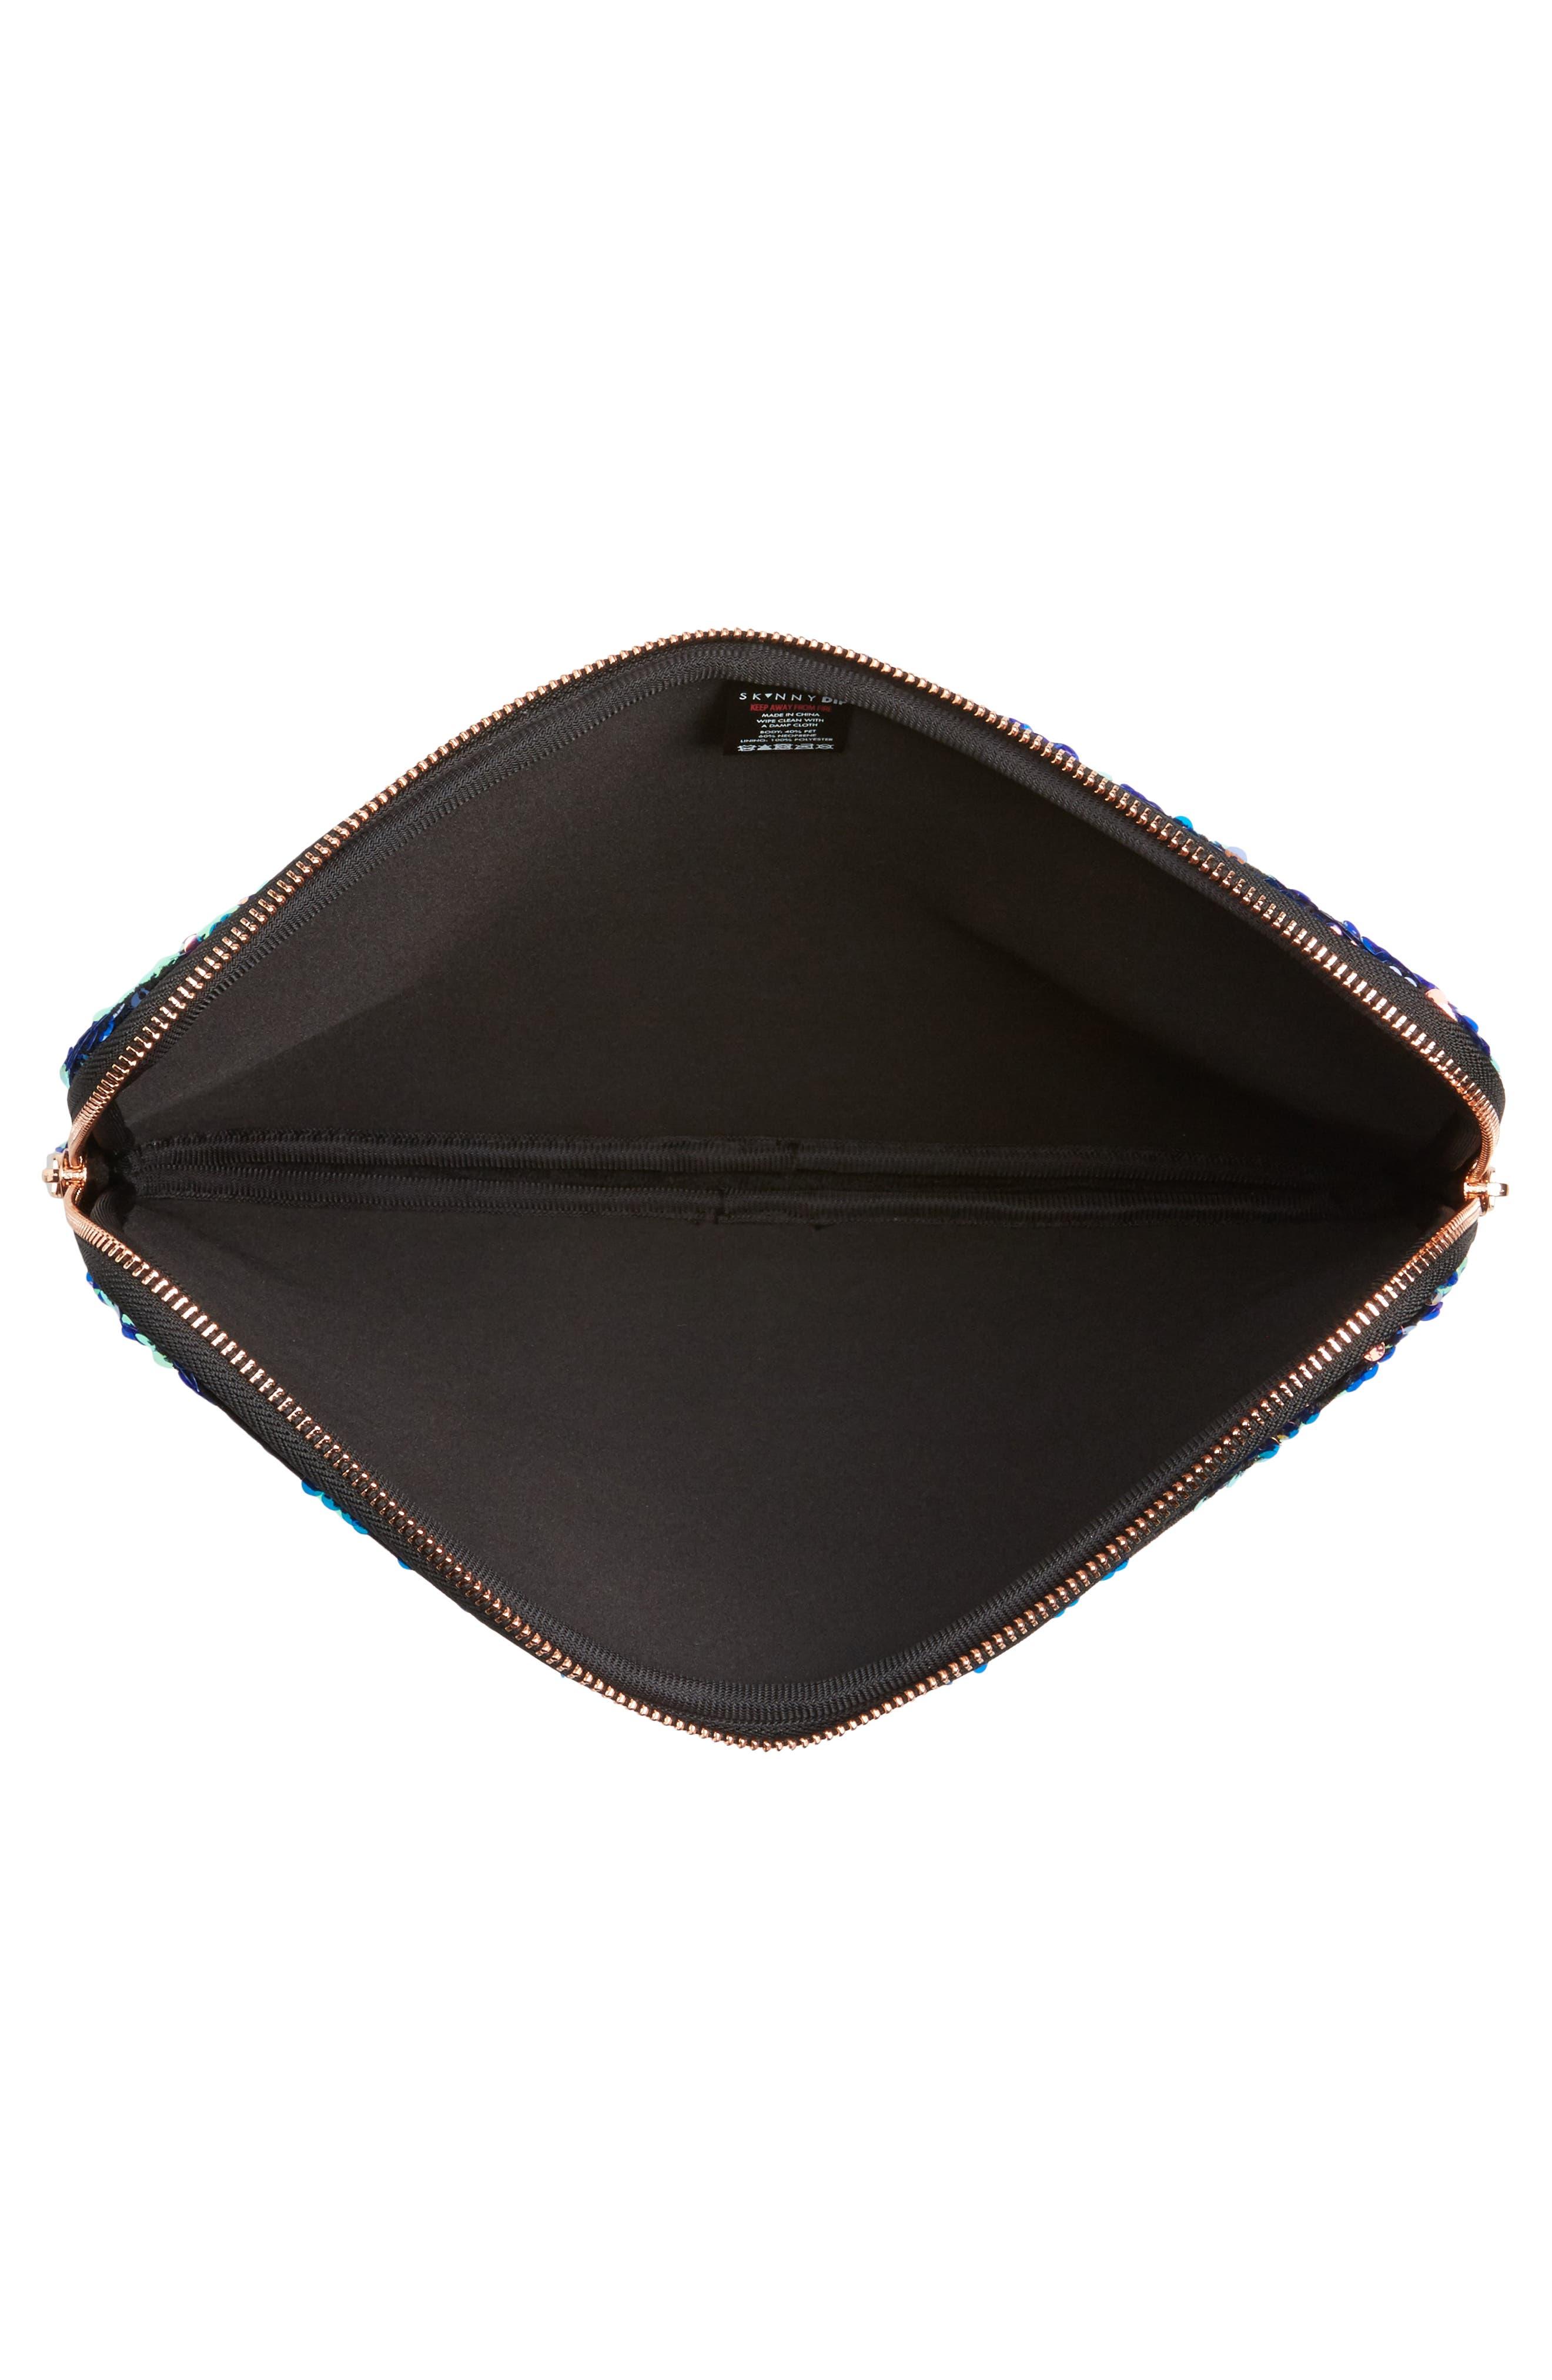 Alternate Image 3  - Skinny Dip Luxe 13-Inch Laptop Case